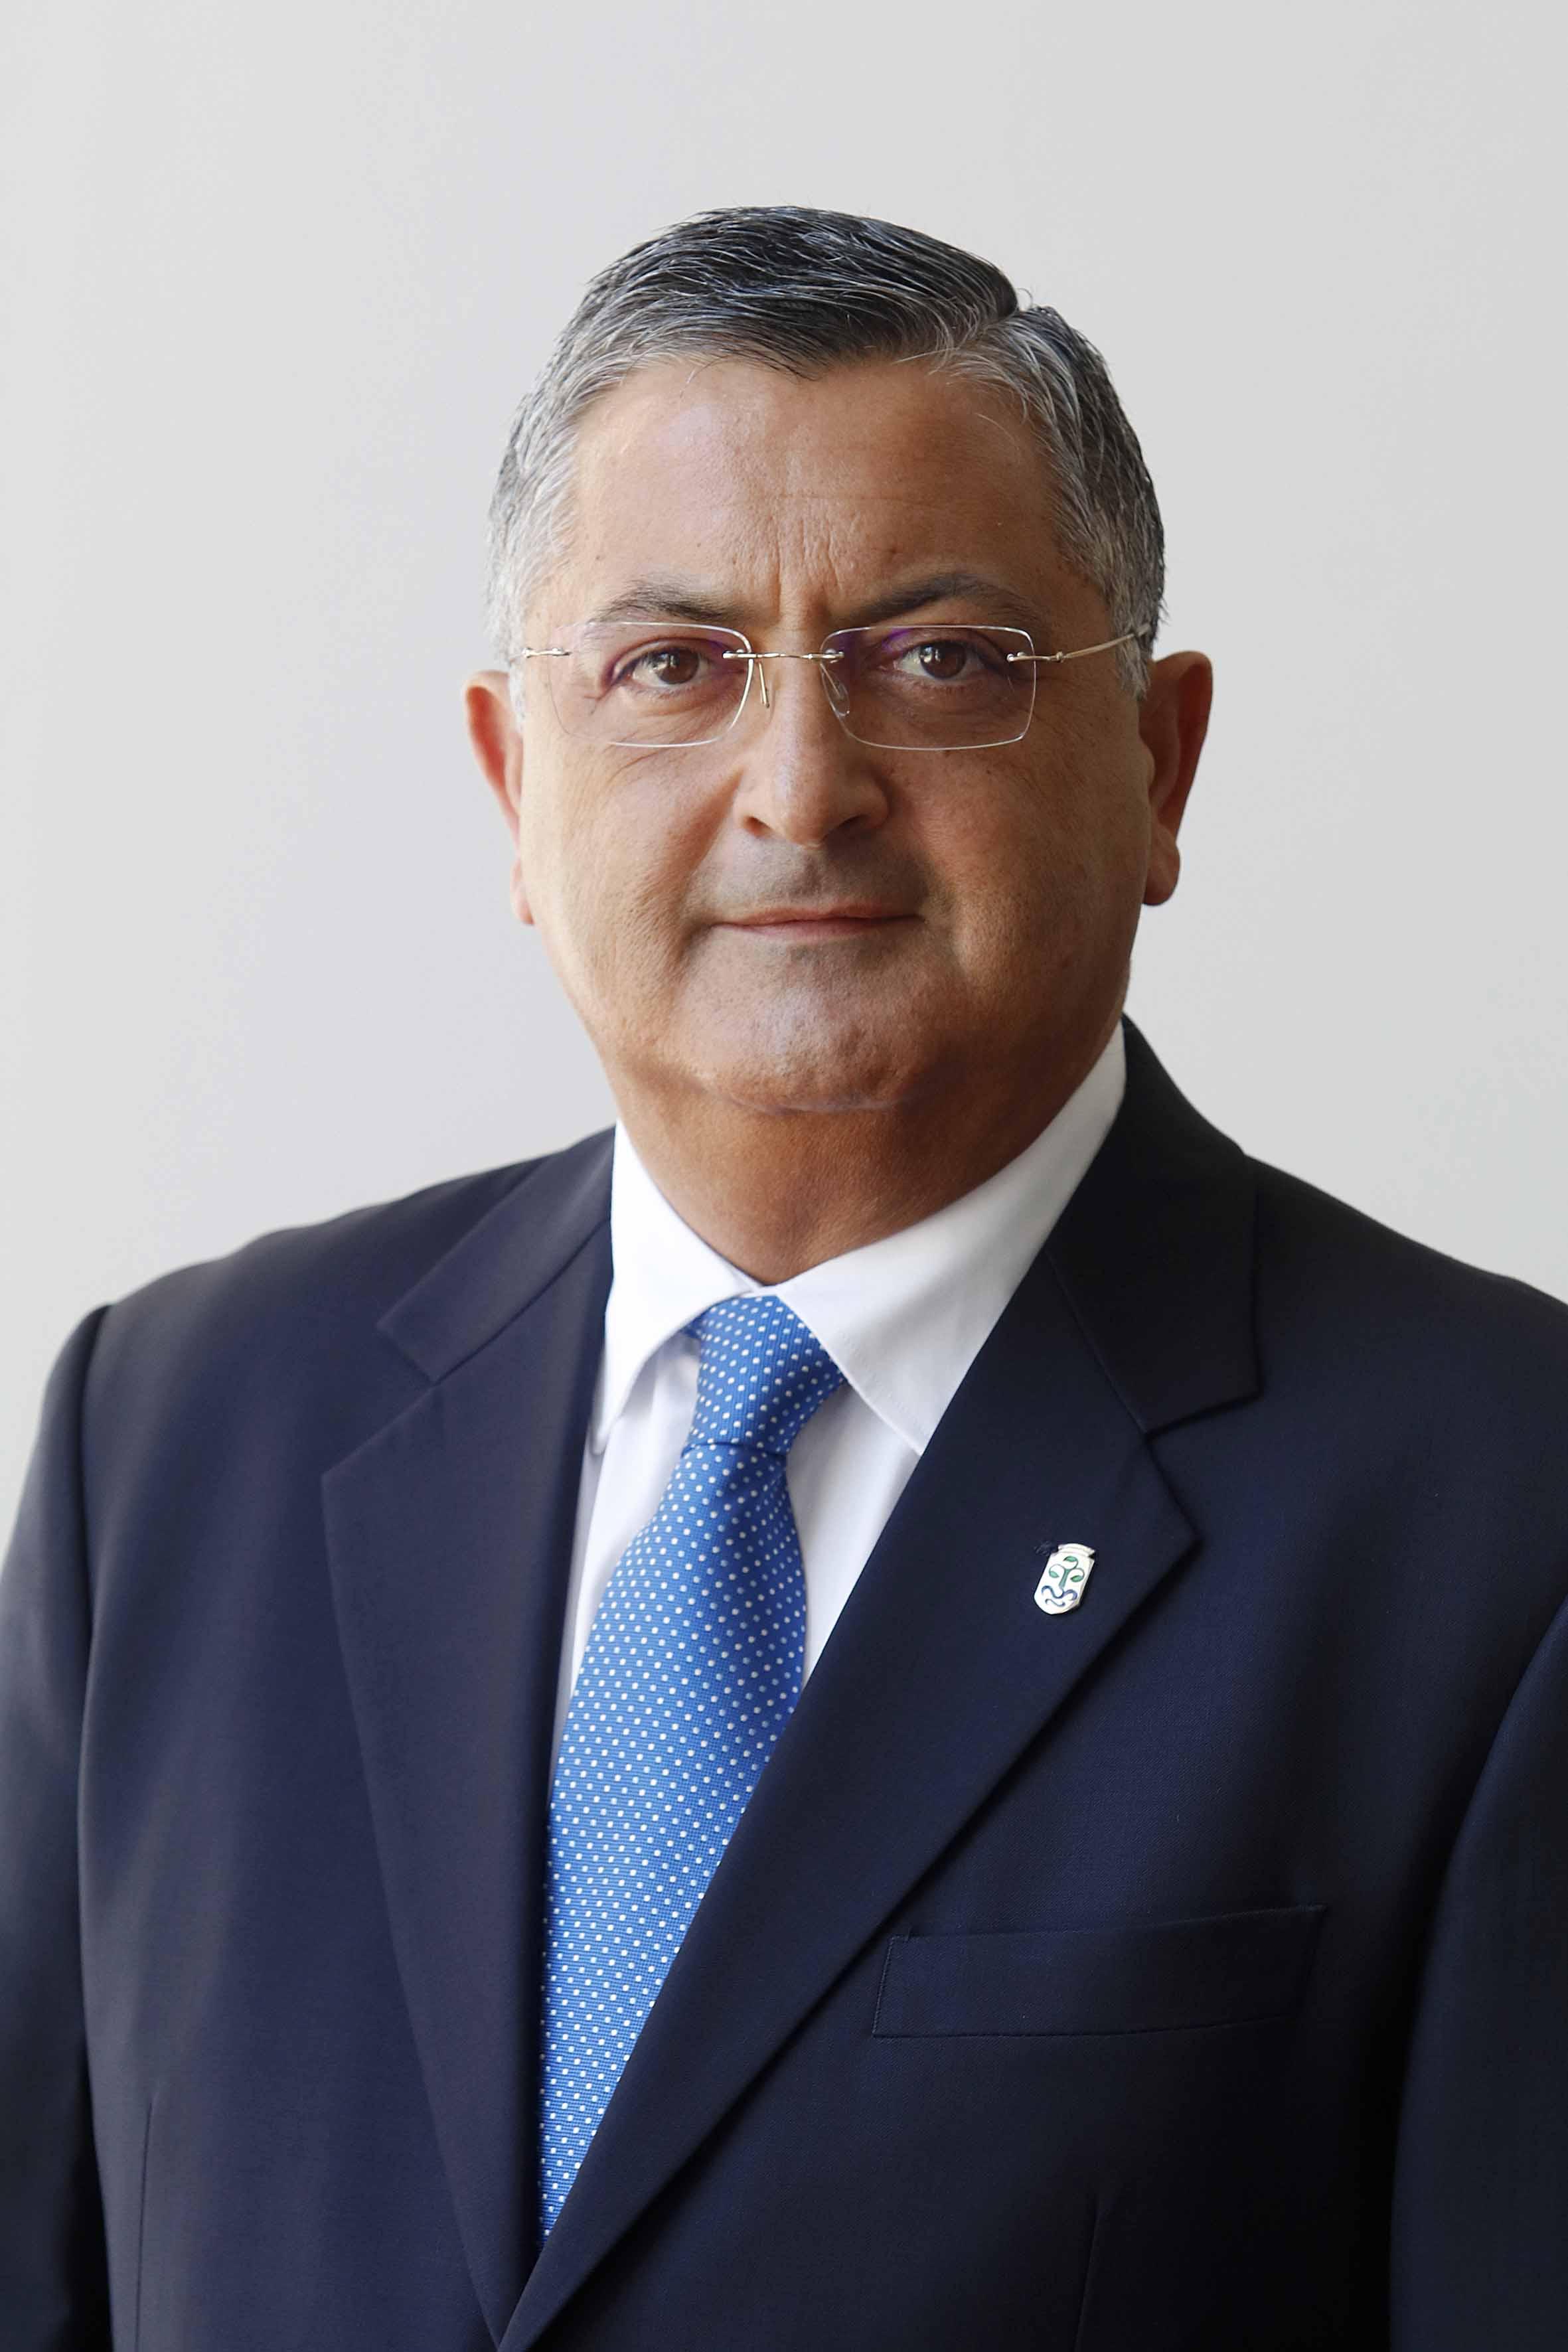 Don Ernesto Pedrosa